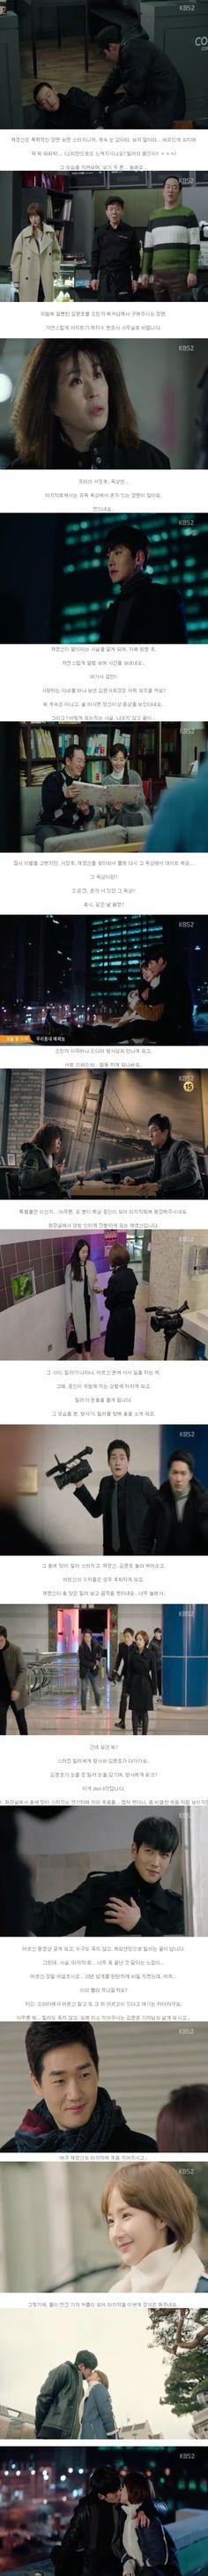 Healer (힐러) Korean - Drama - Episode 20 - Picture @ HanCinema :: The Korean Movie and Drama Database